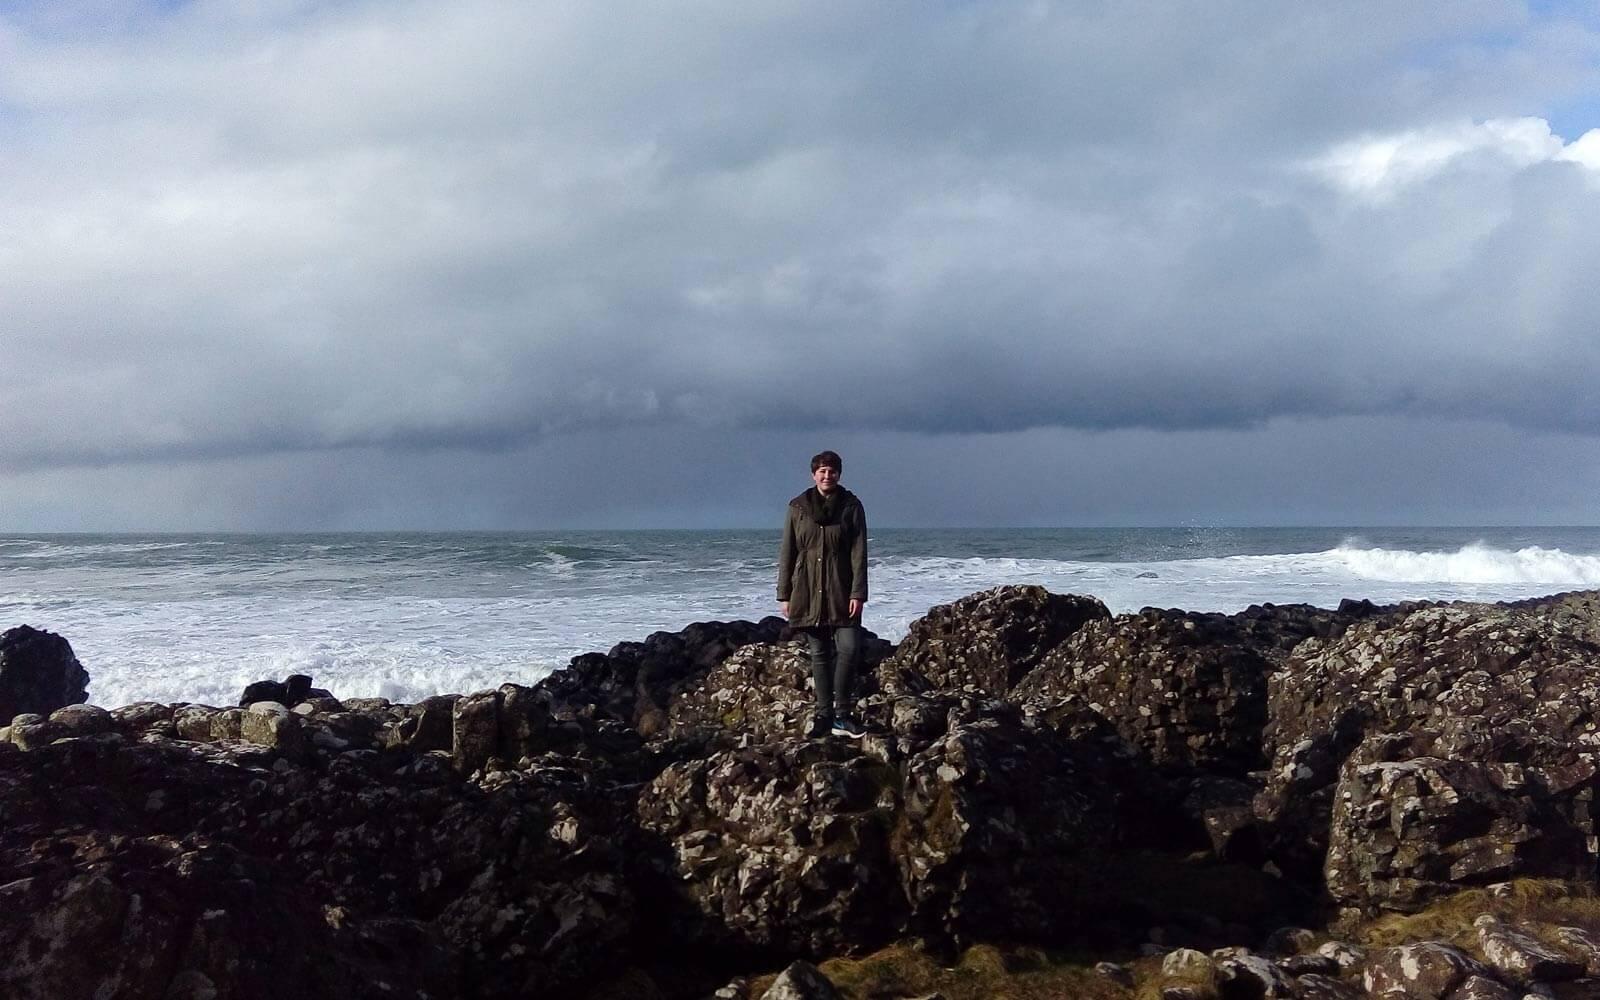 Ronja an Irlands Küste